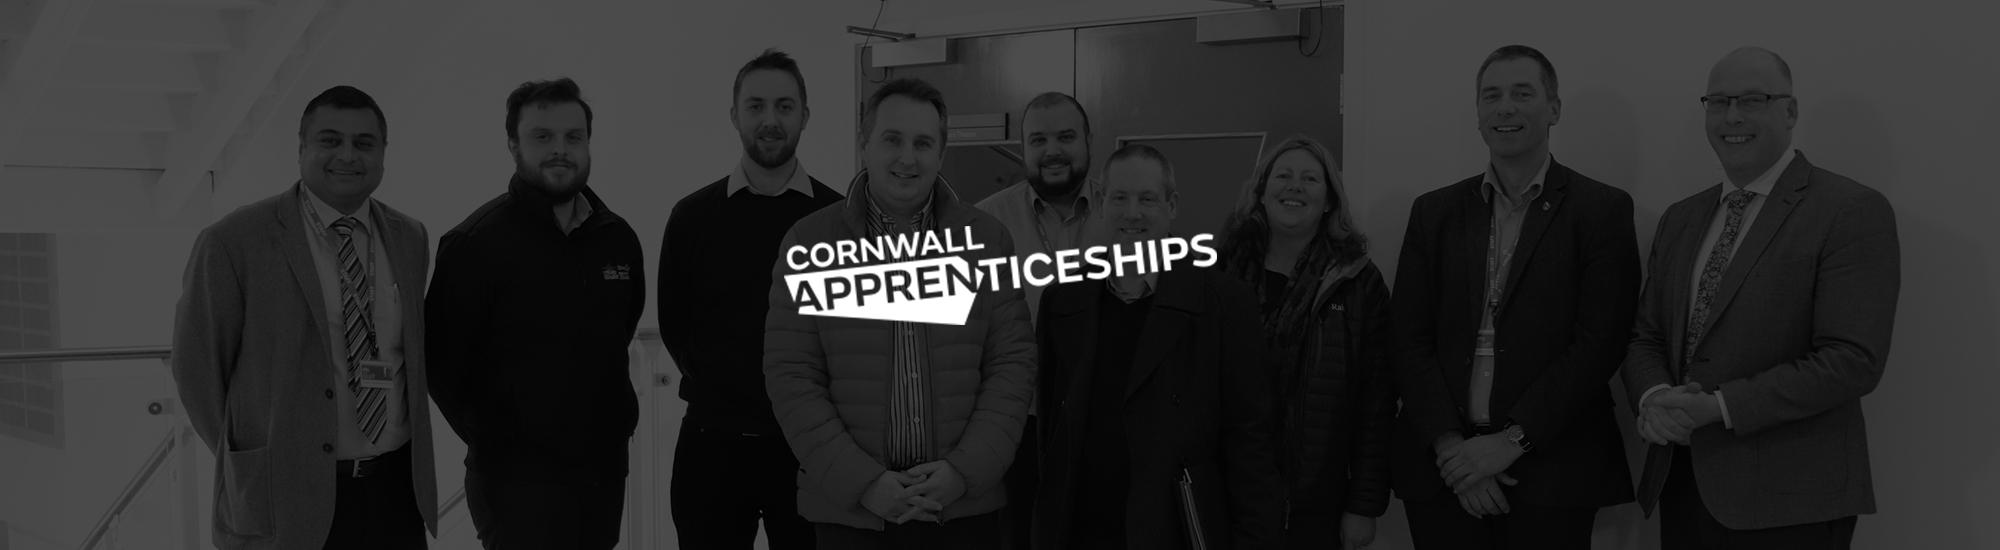 Cornwall Apprenticeships